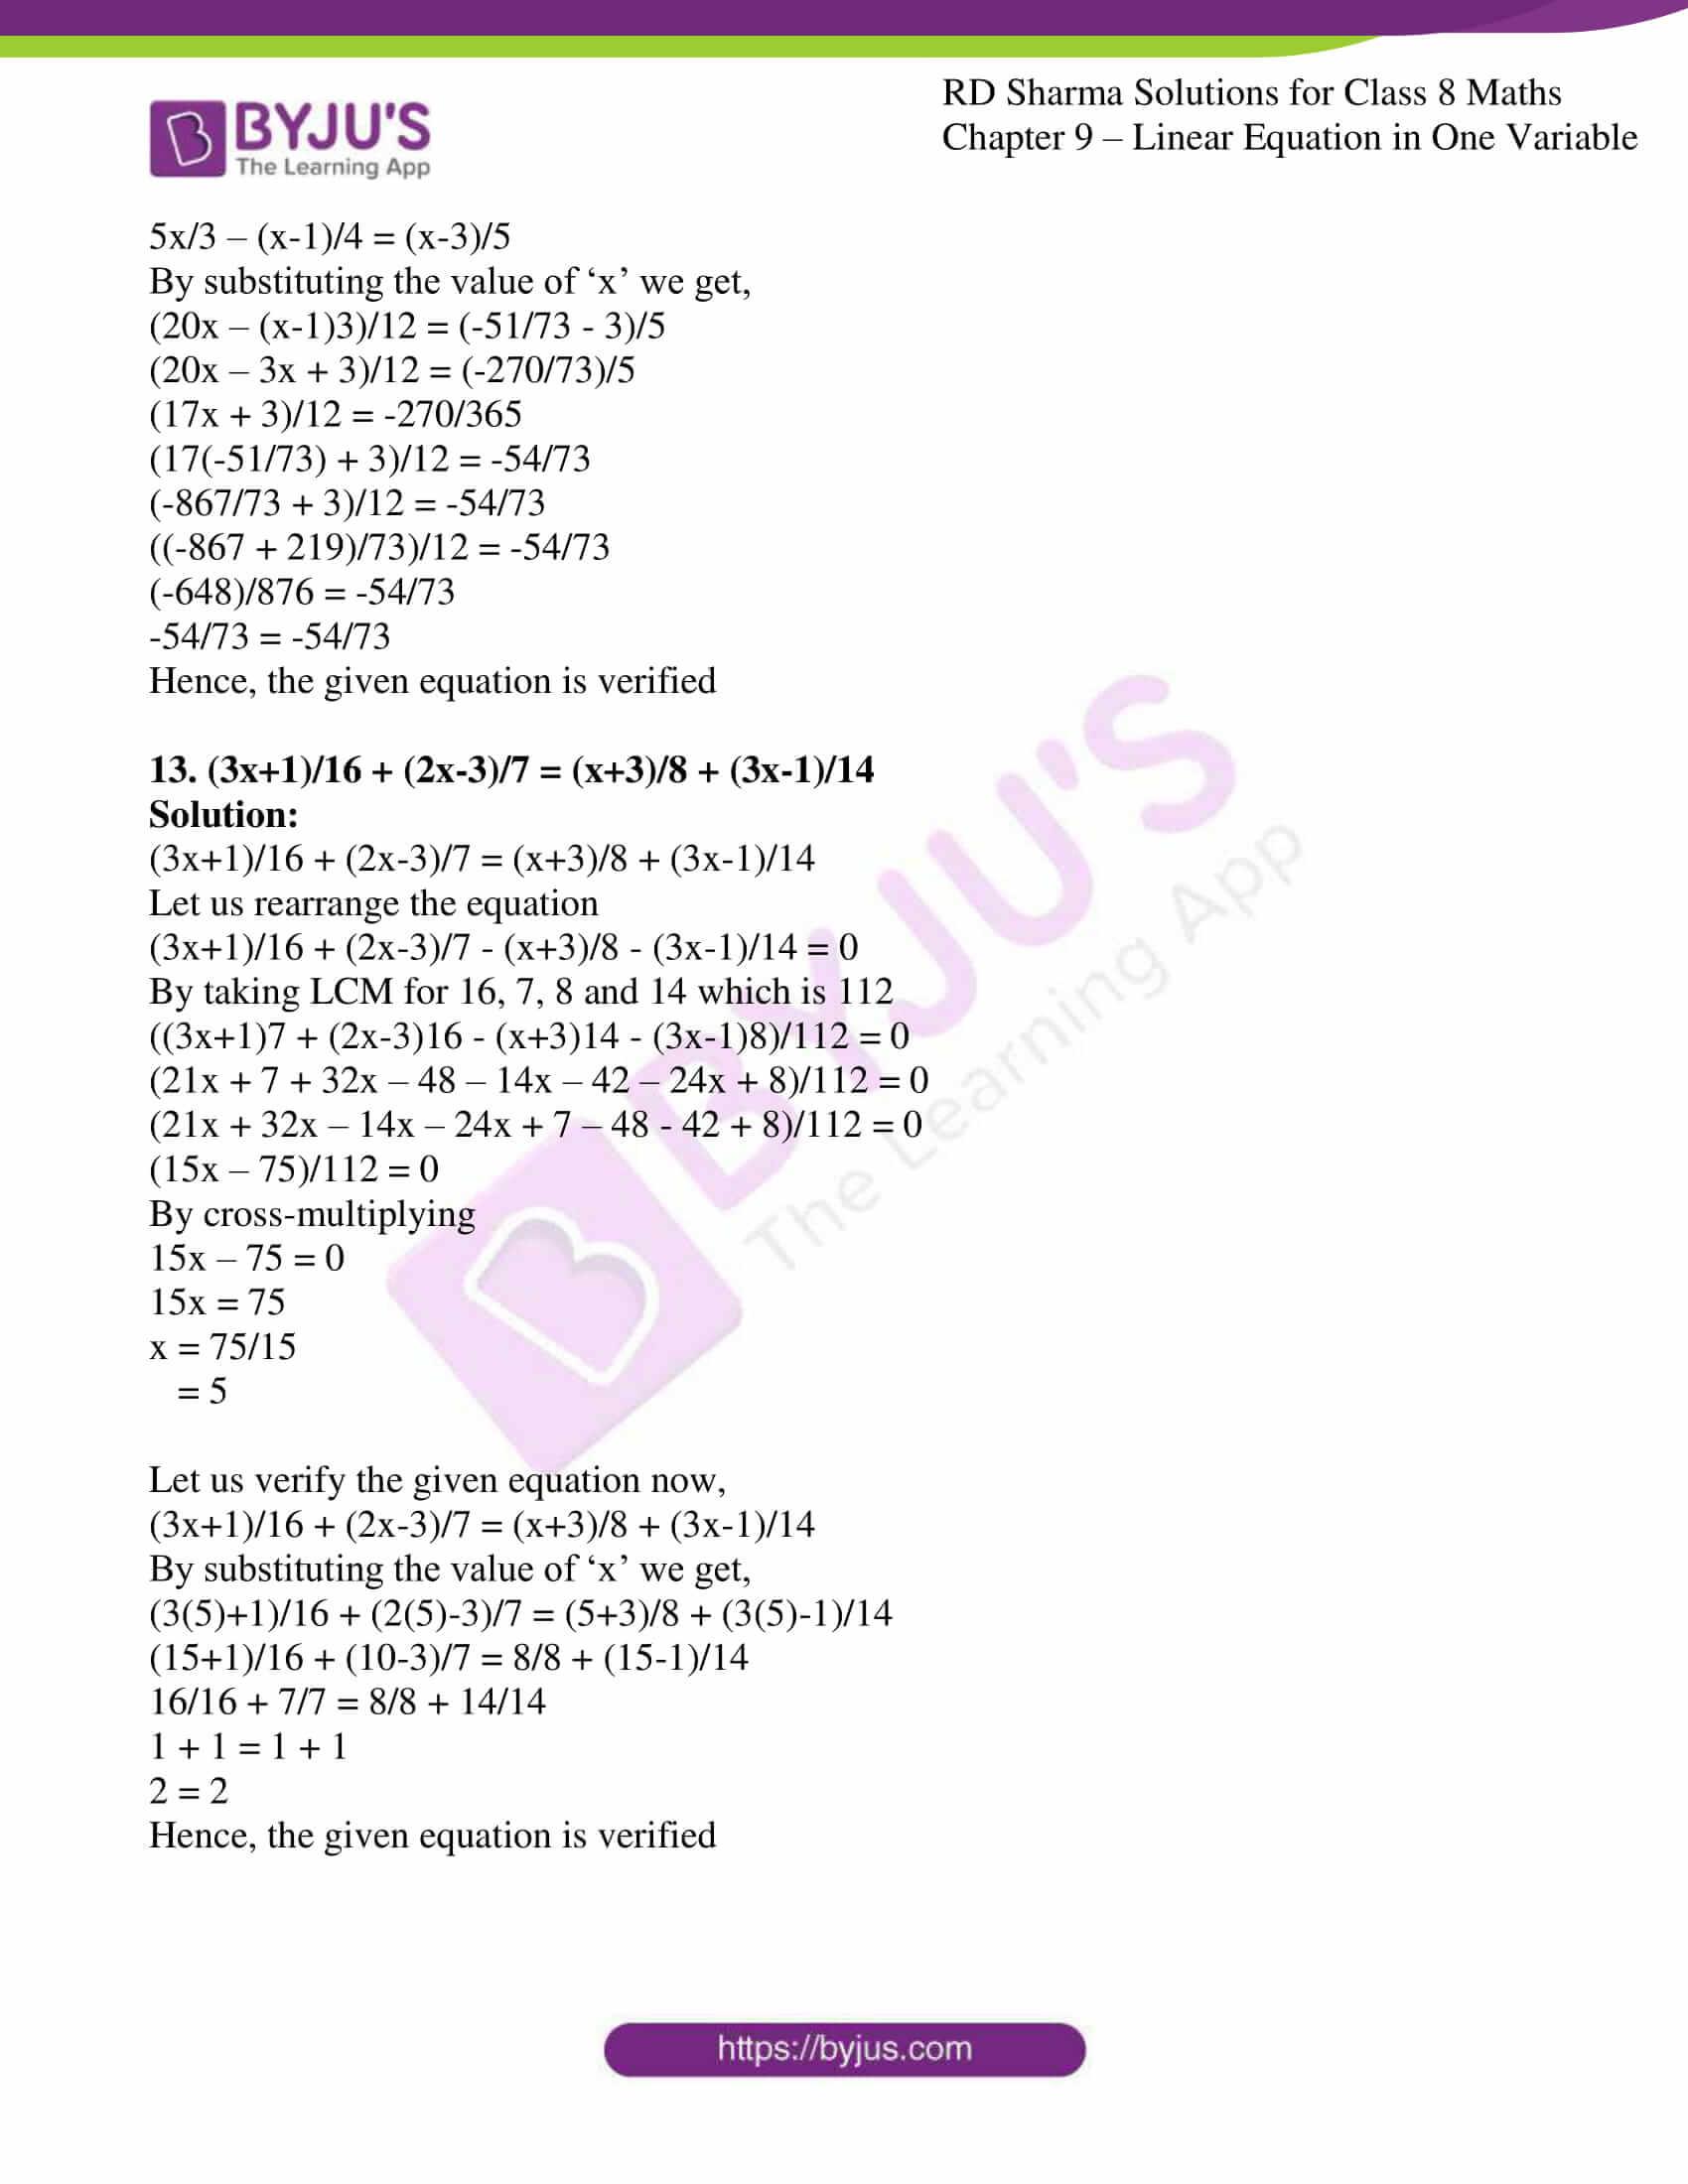 rd sharma class 8 maths chapter 9 exercise 2 08